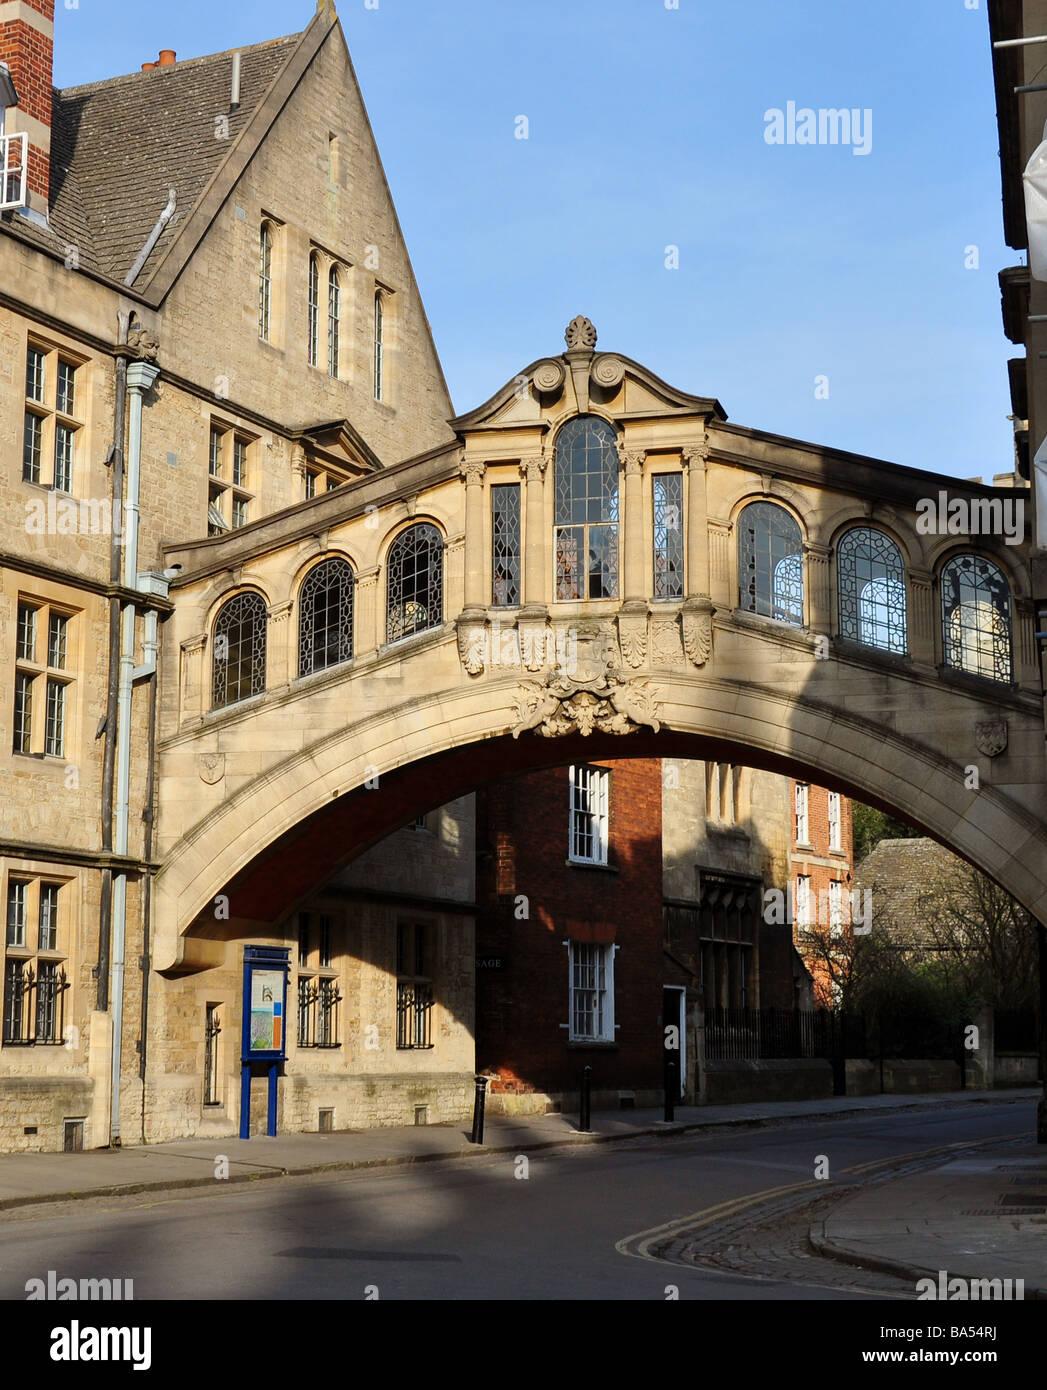 Bridge of Sighs, New Street, Oxford - Stock Image